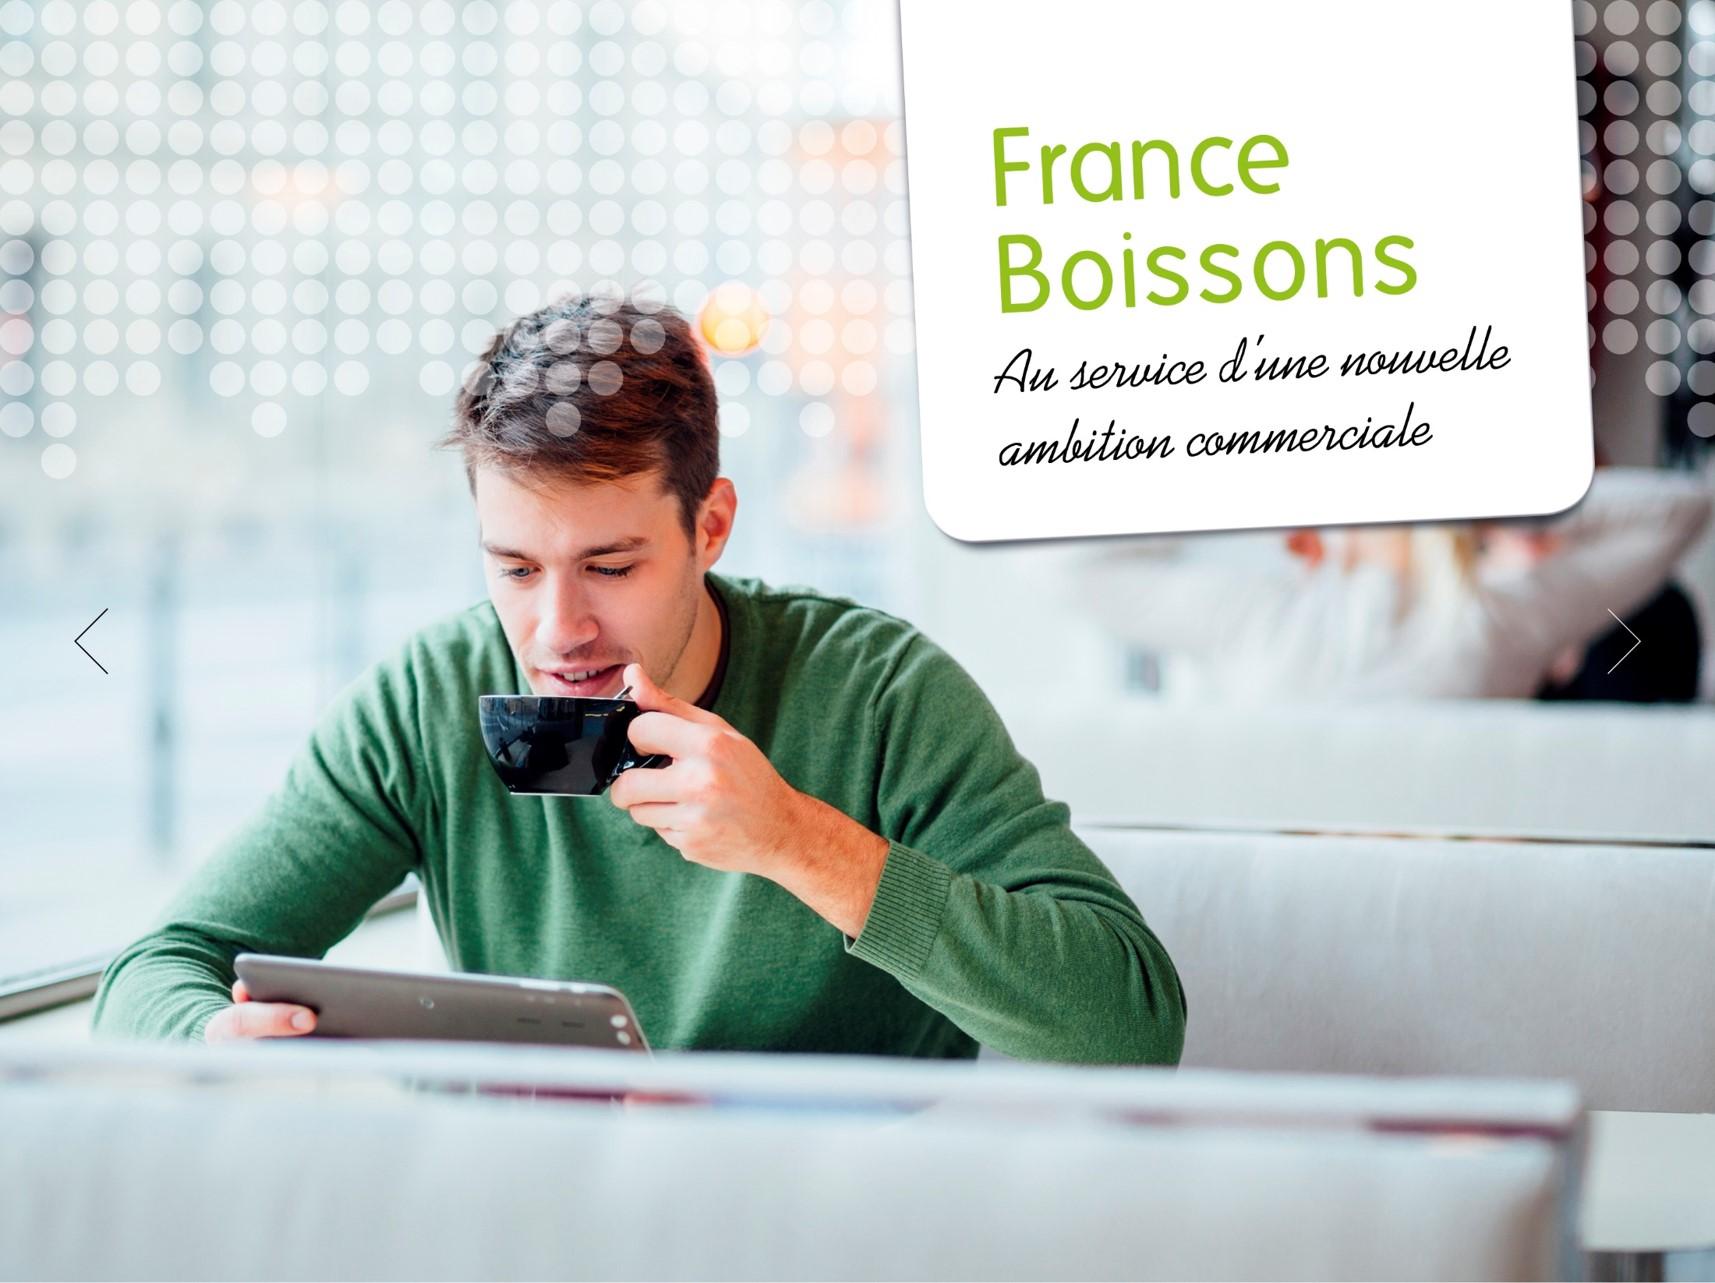 FRANCE BOISSONS : Data-Driven Marketing - Stratégie digitale